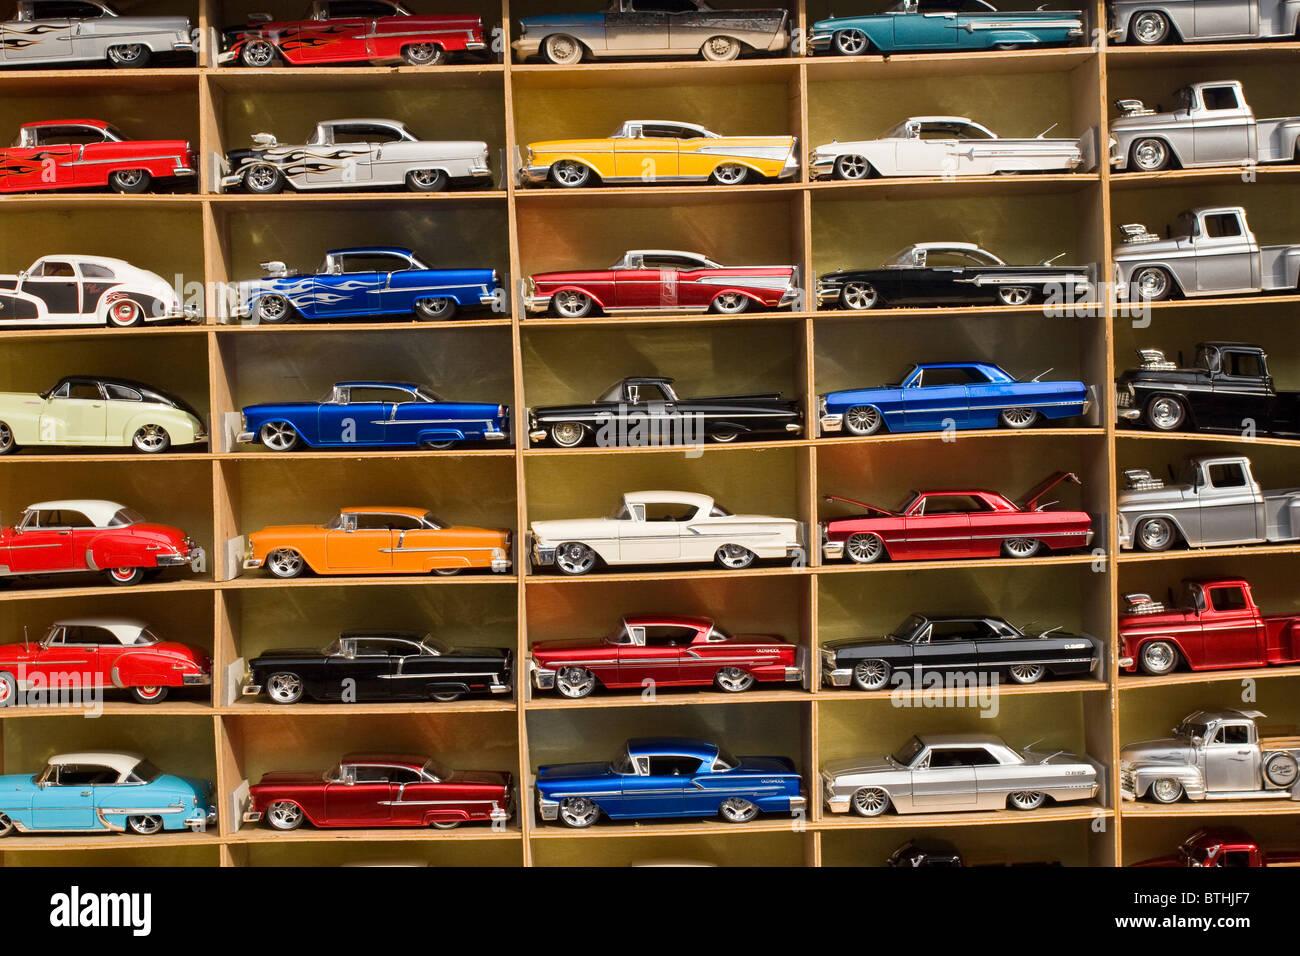 Shadowbox of diecast model cars. Stock Photo